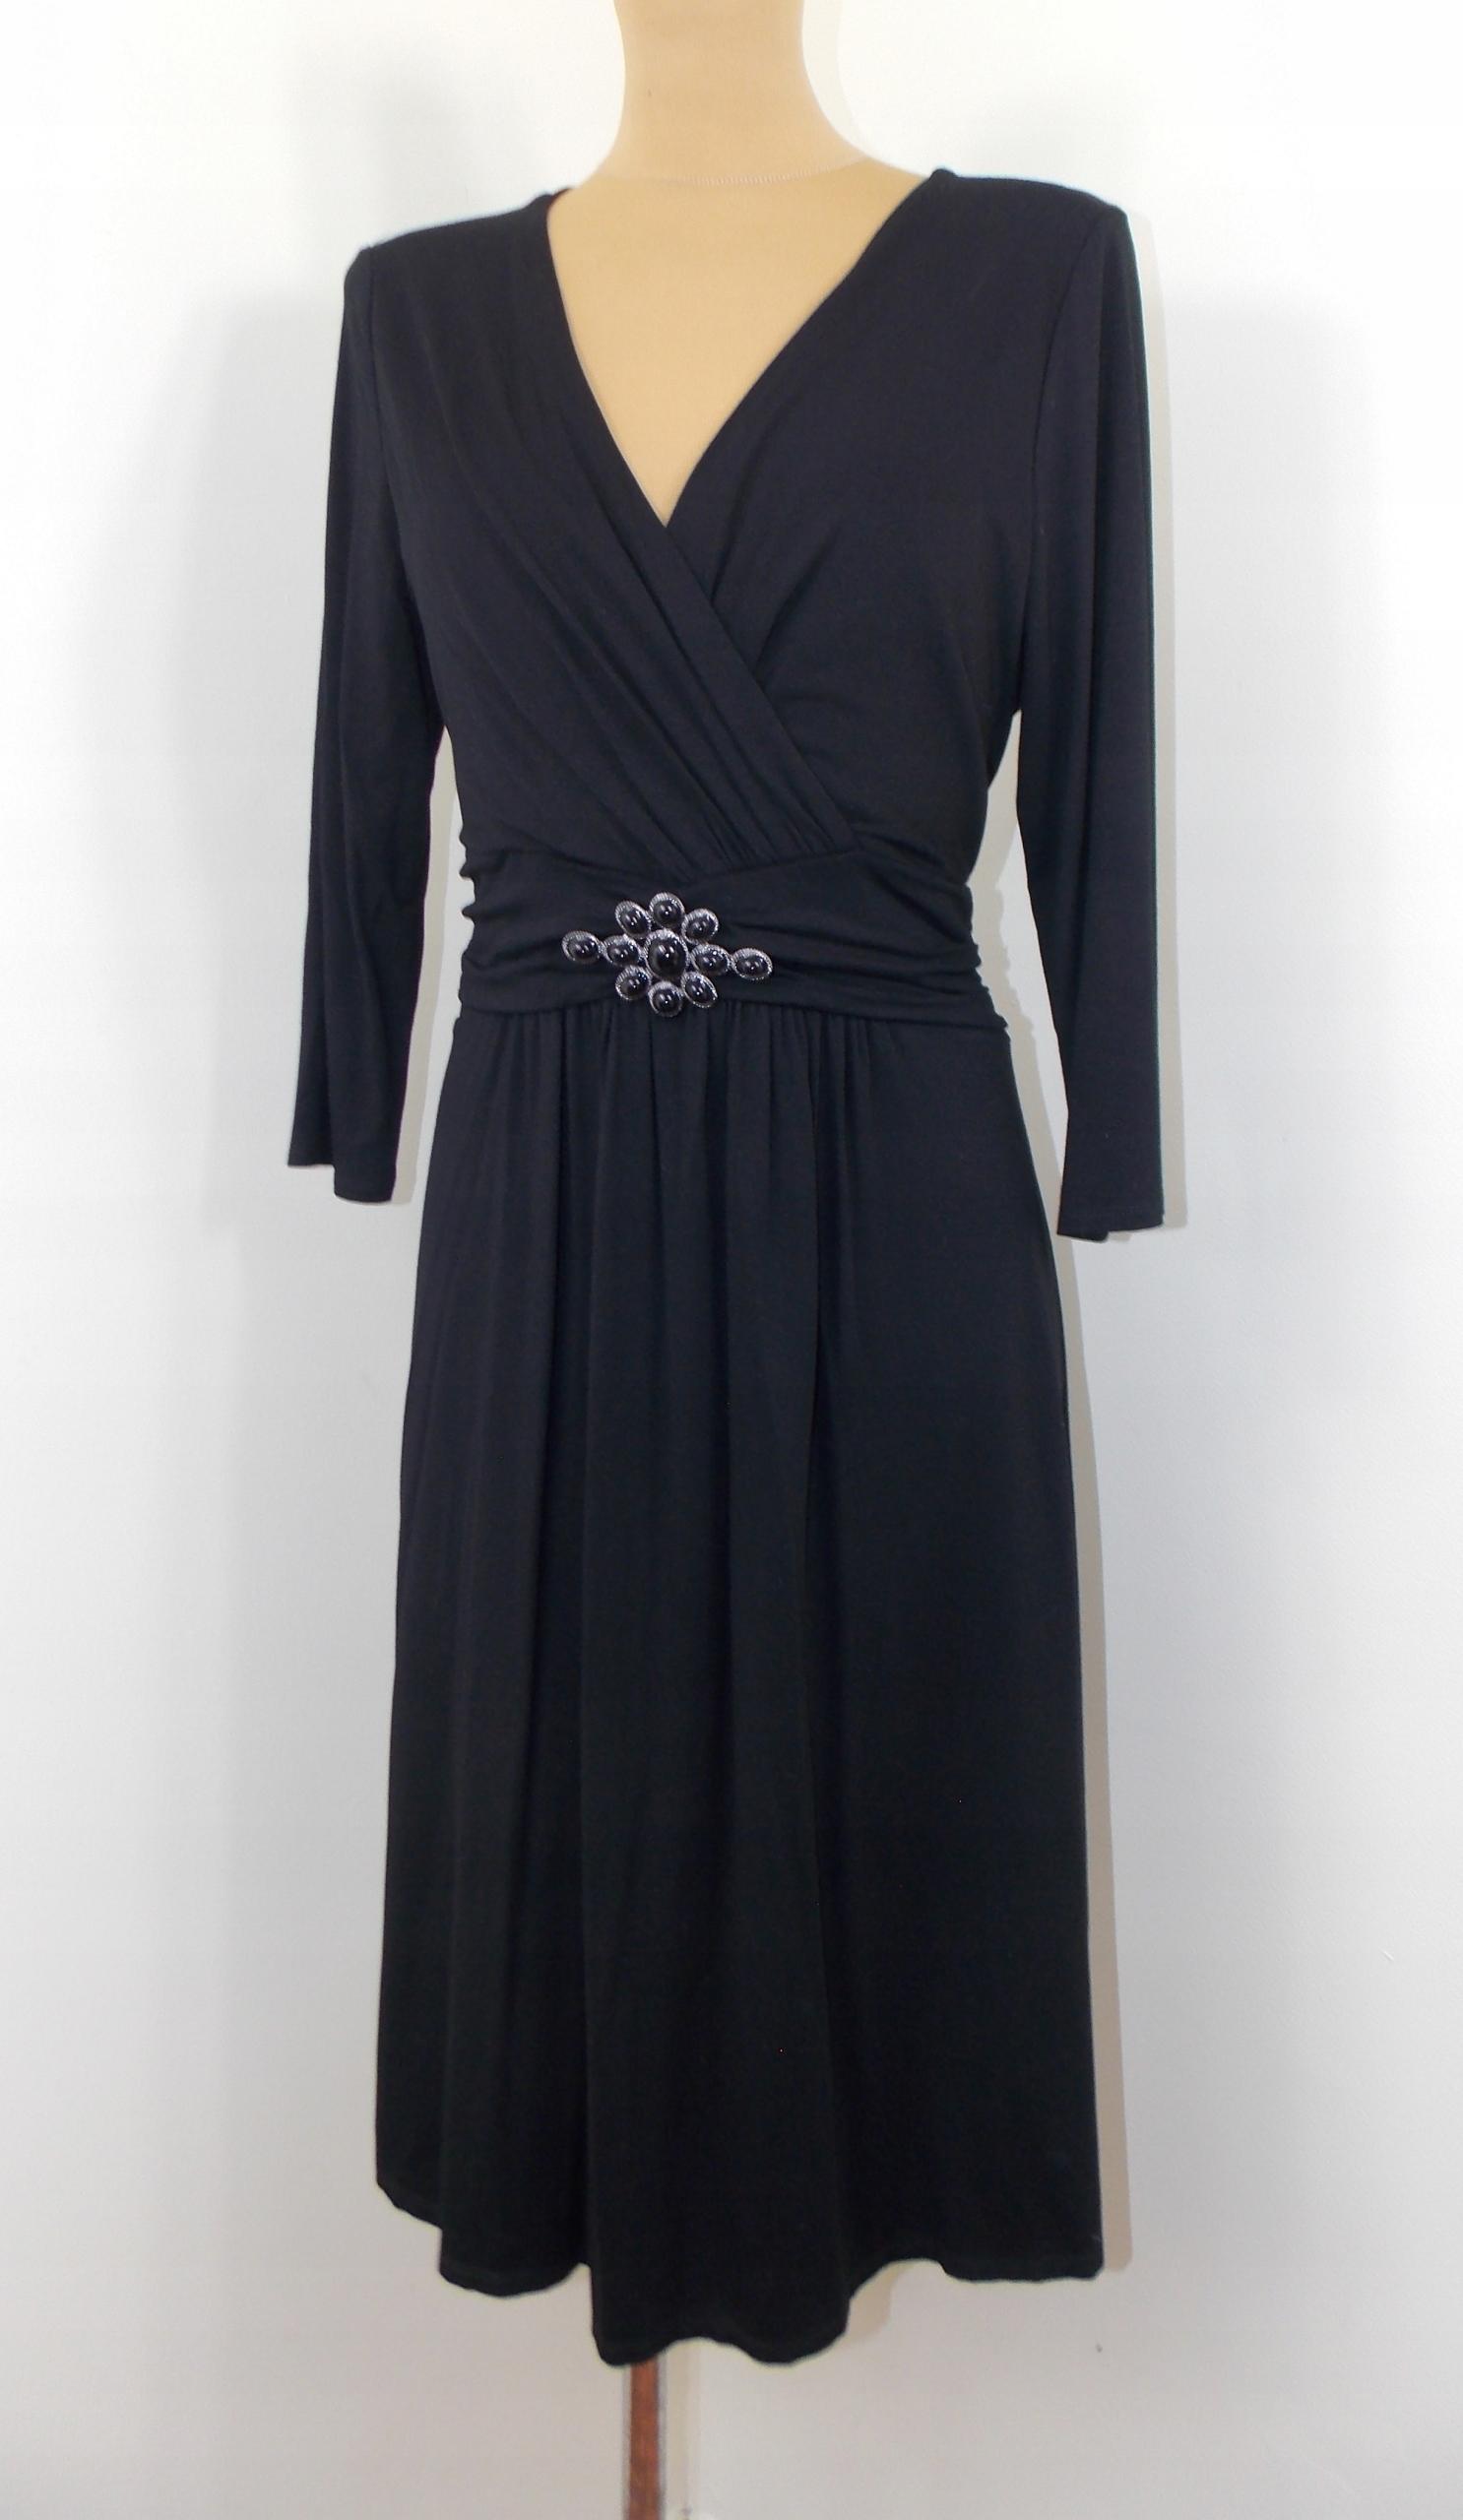 sukienka LEWIS styl ZARA elegancka klasyczna 42